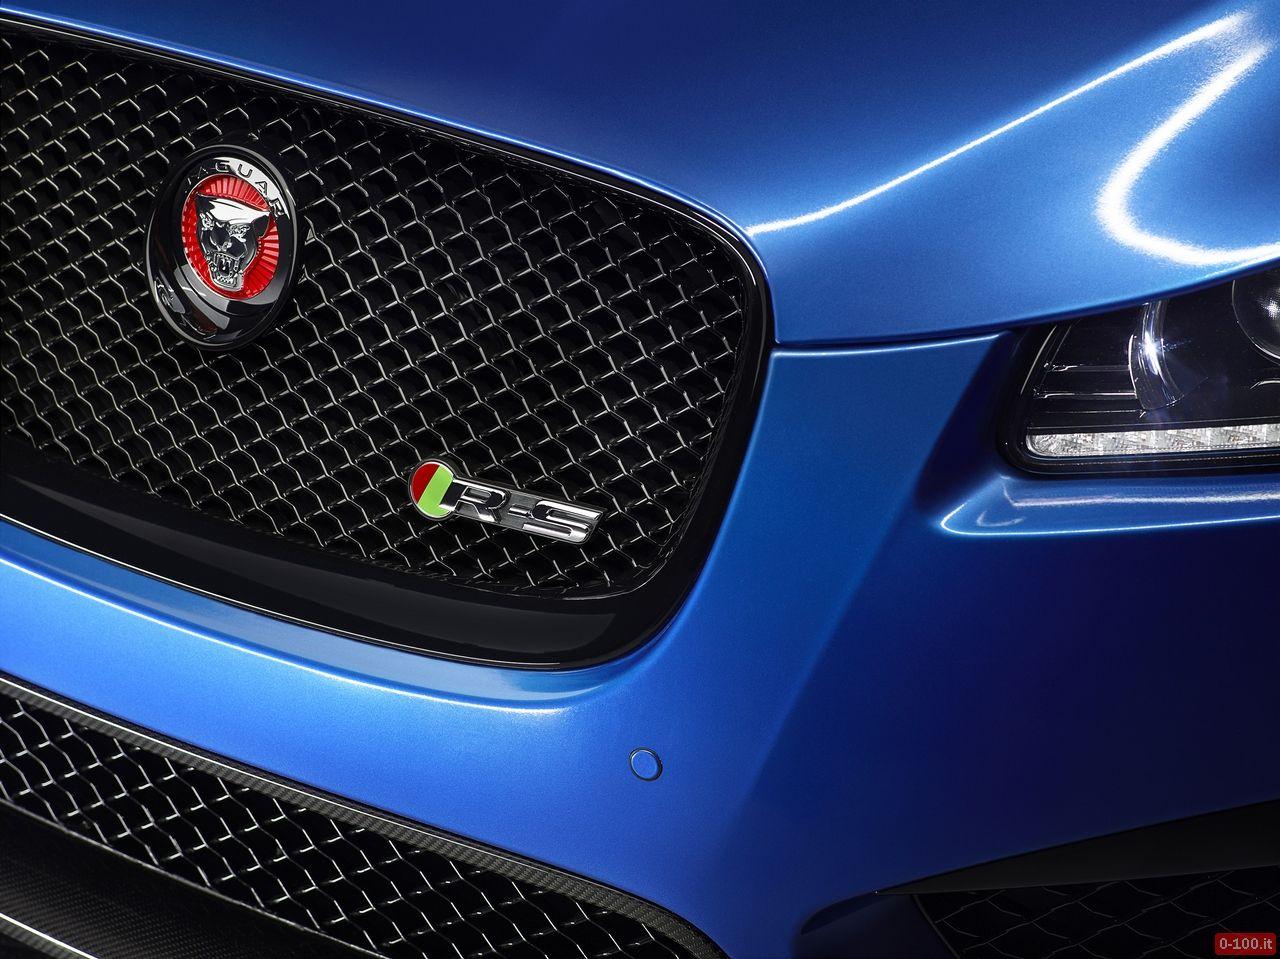 ginevra-2014-jaguar-xf-model-year-2015-xfr-s-sportbrake-0-100_36